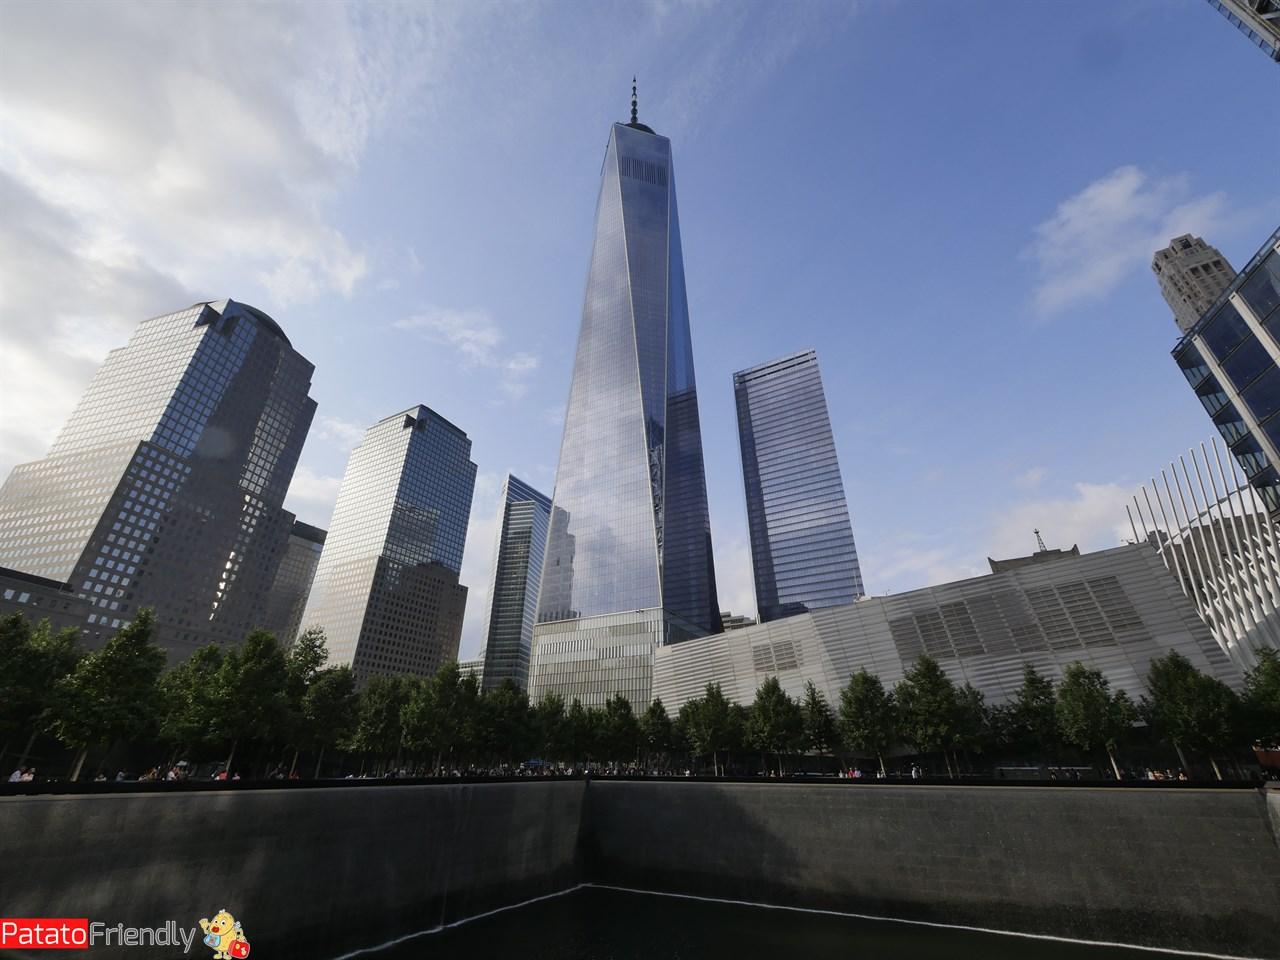 [cml_media_alt id='11833']New York coi bimbi - Memorial[/cml_media_alt]